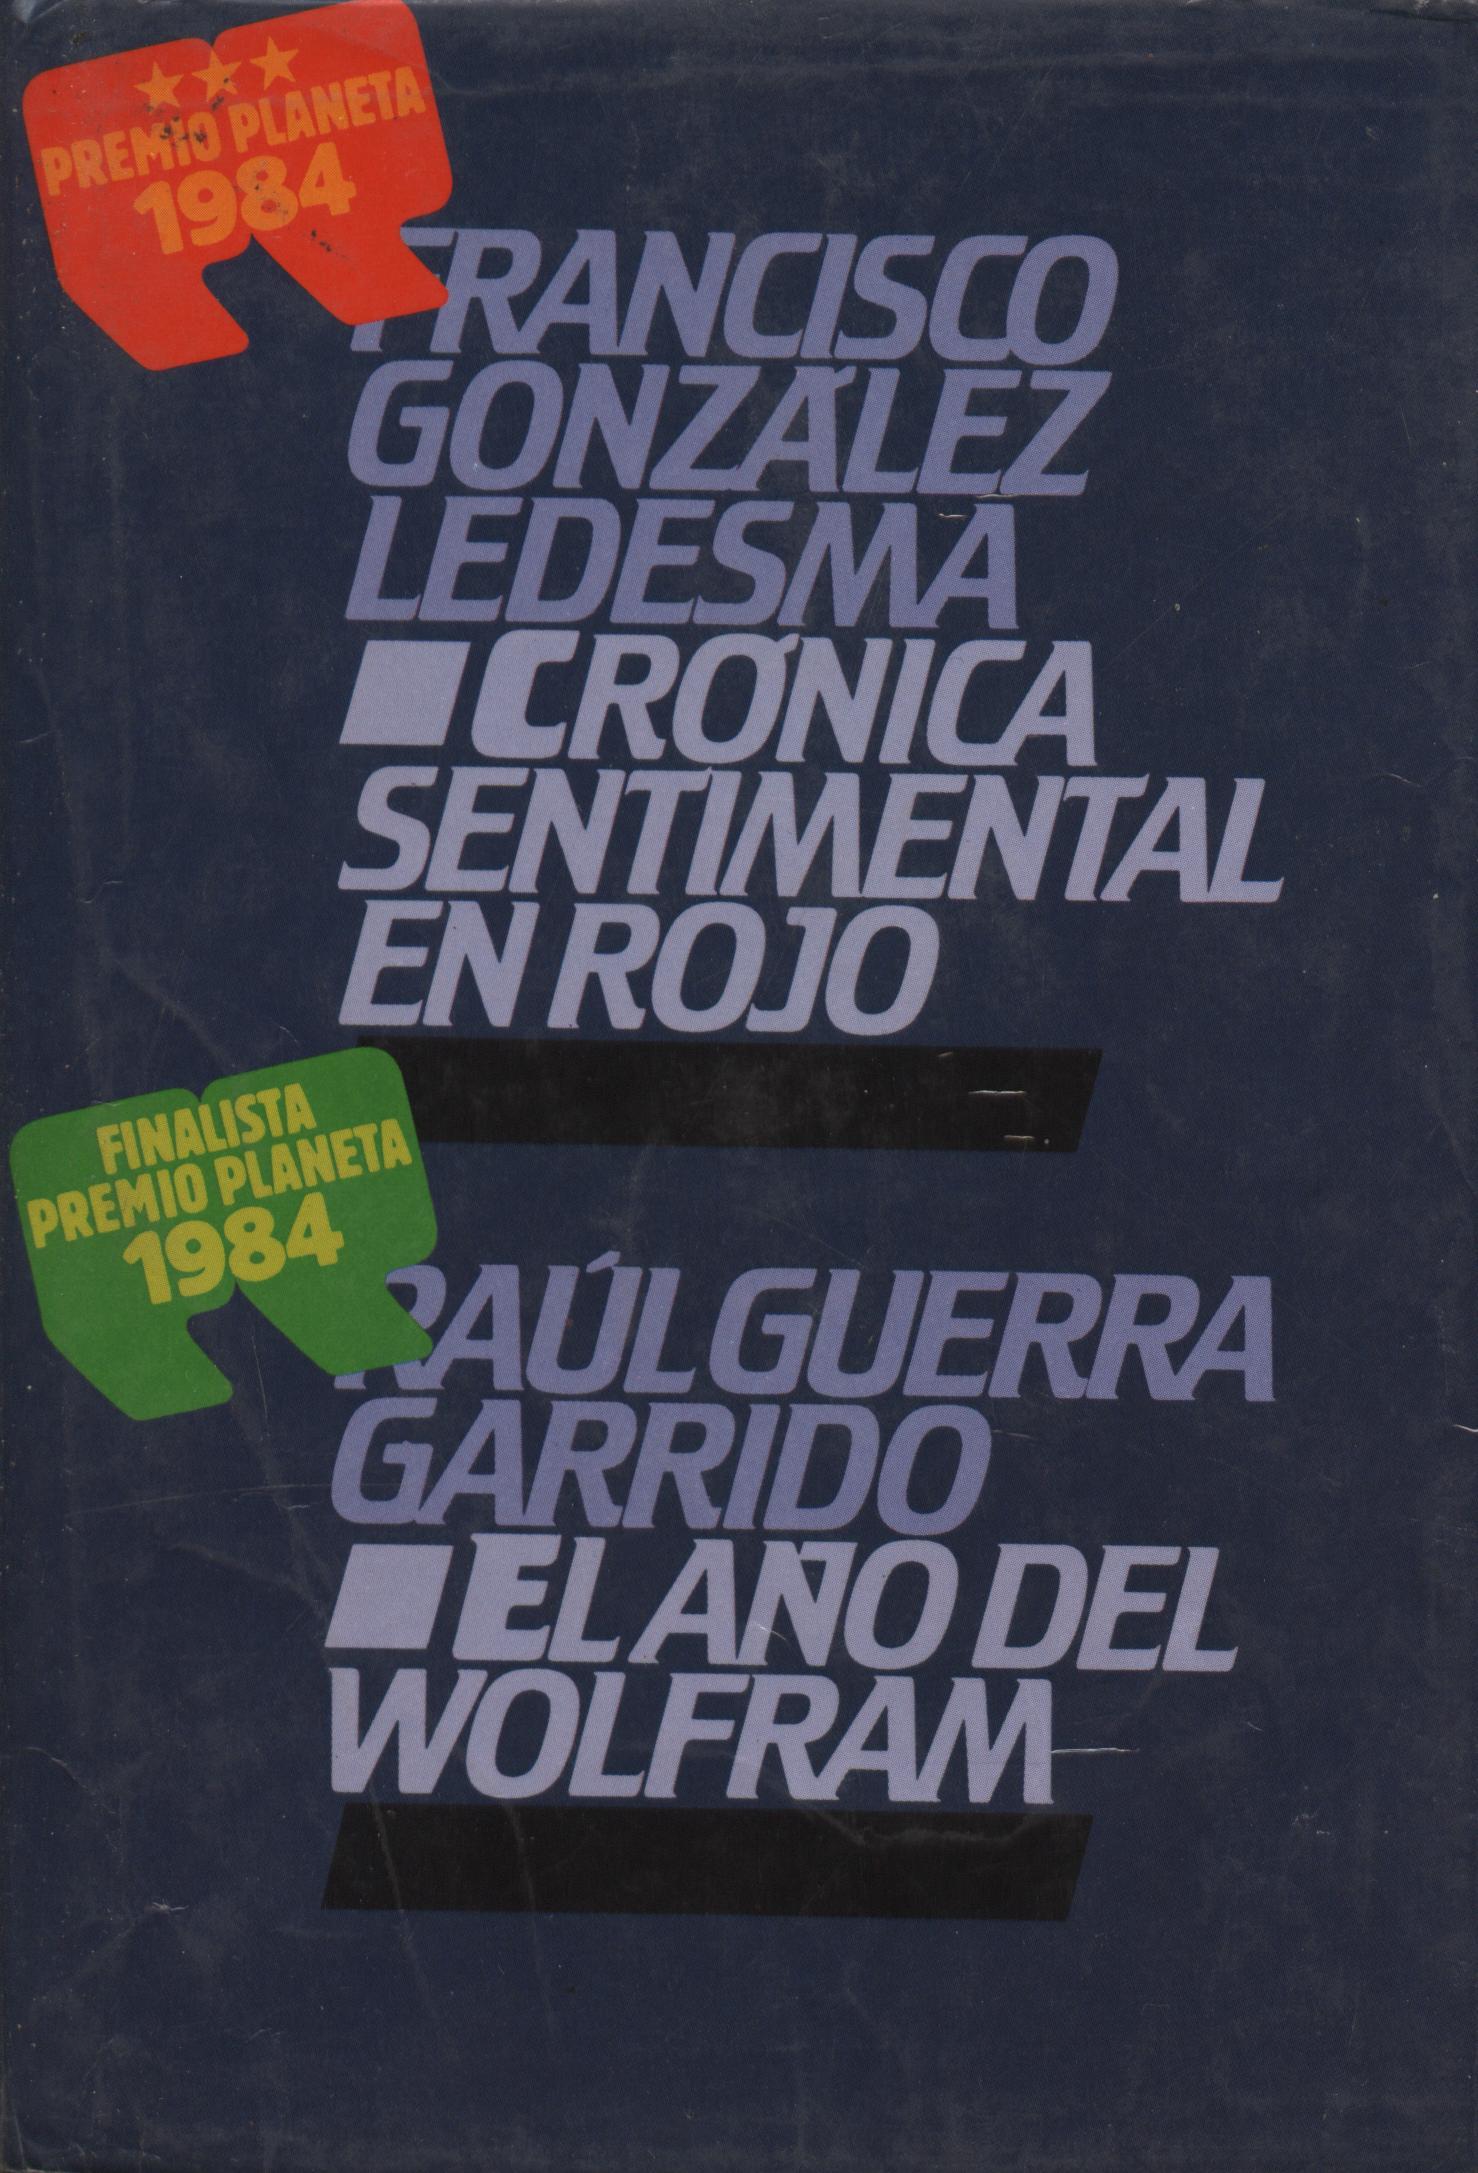 Cronica sentimental en rojo + El año del Wolfram - Francisco Gonzalez Ledesma + Raúl Guerra Garrido